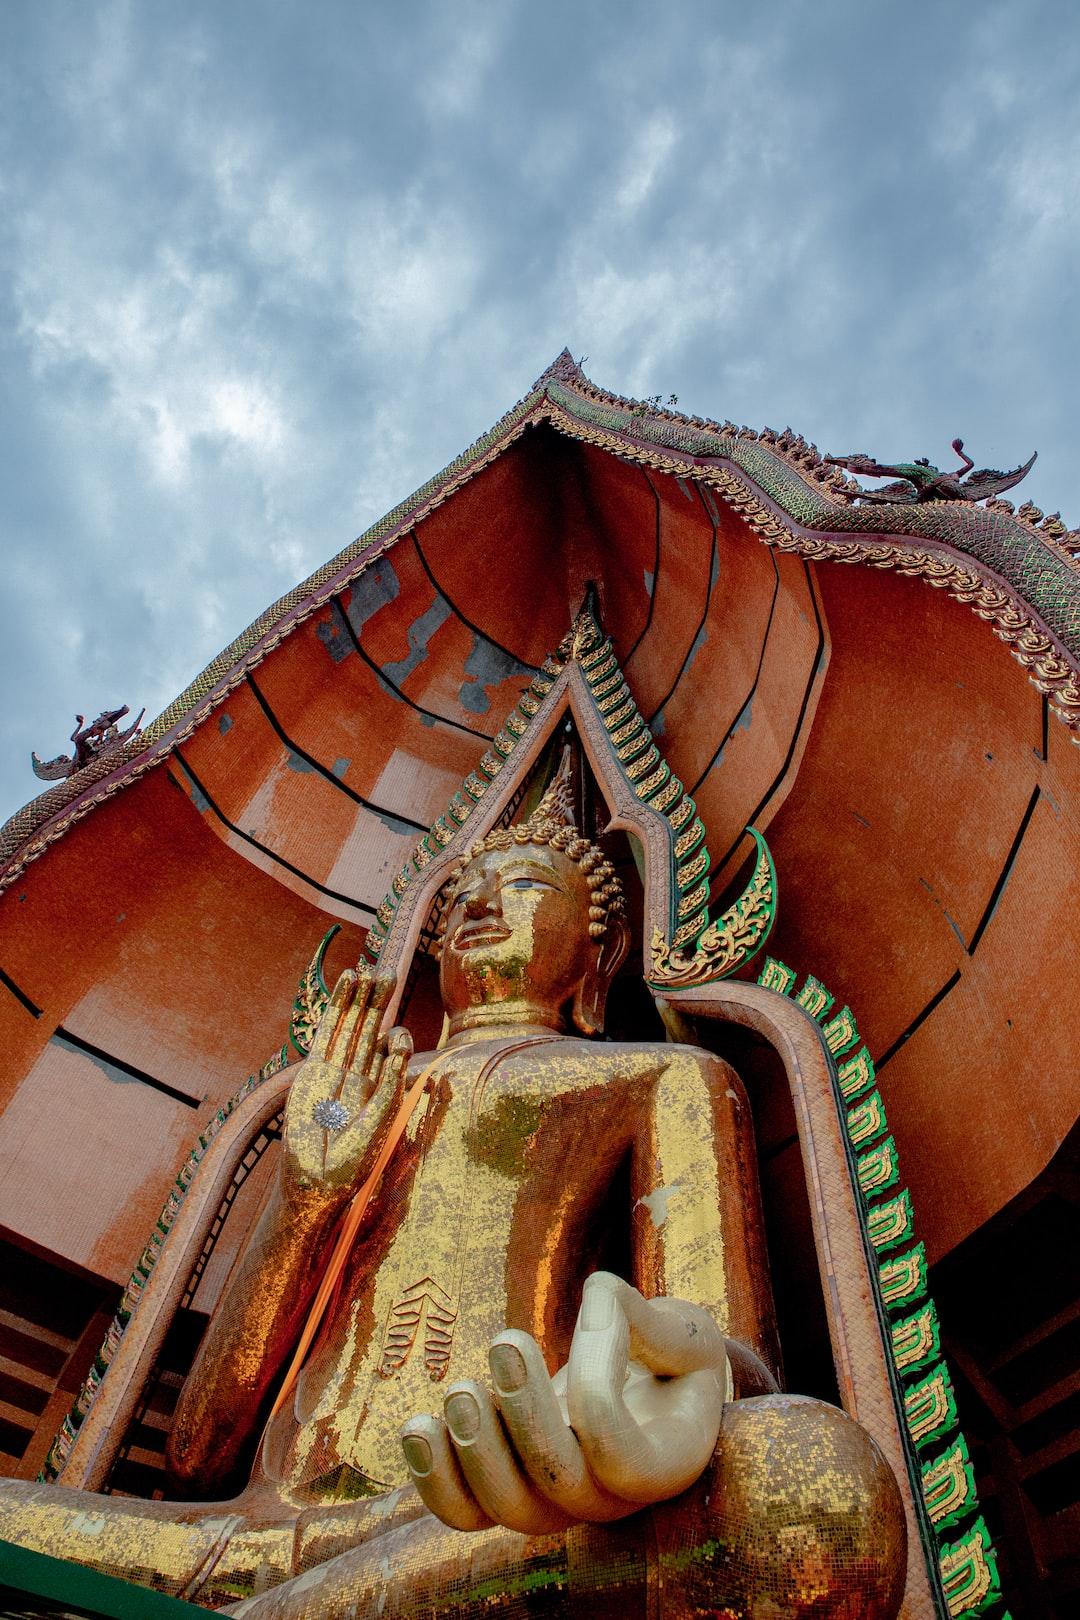 Big Buddha Statue at Wat Tham Sua Temple in Kanchanaburi Province, Thailand